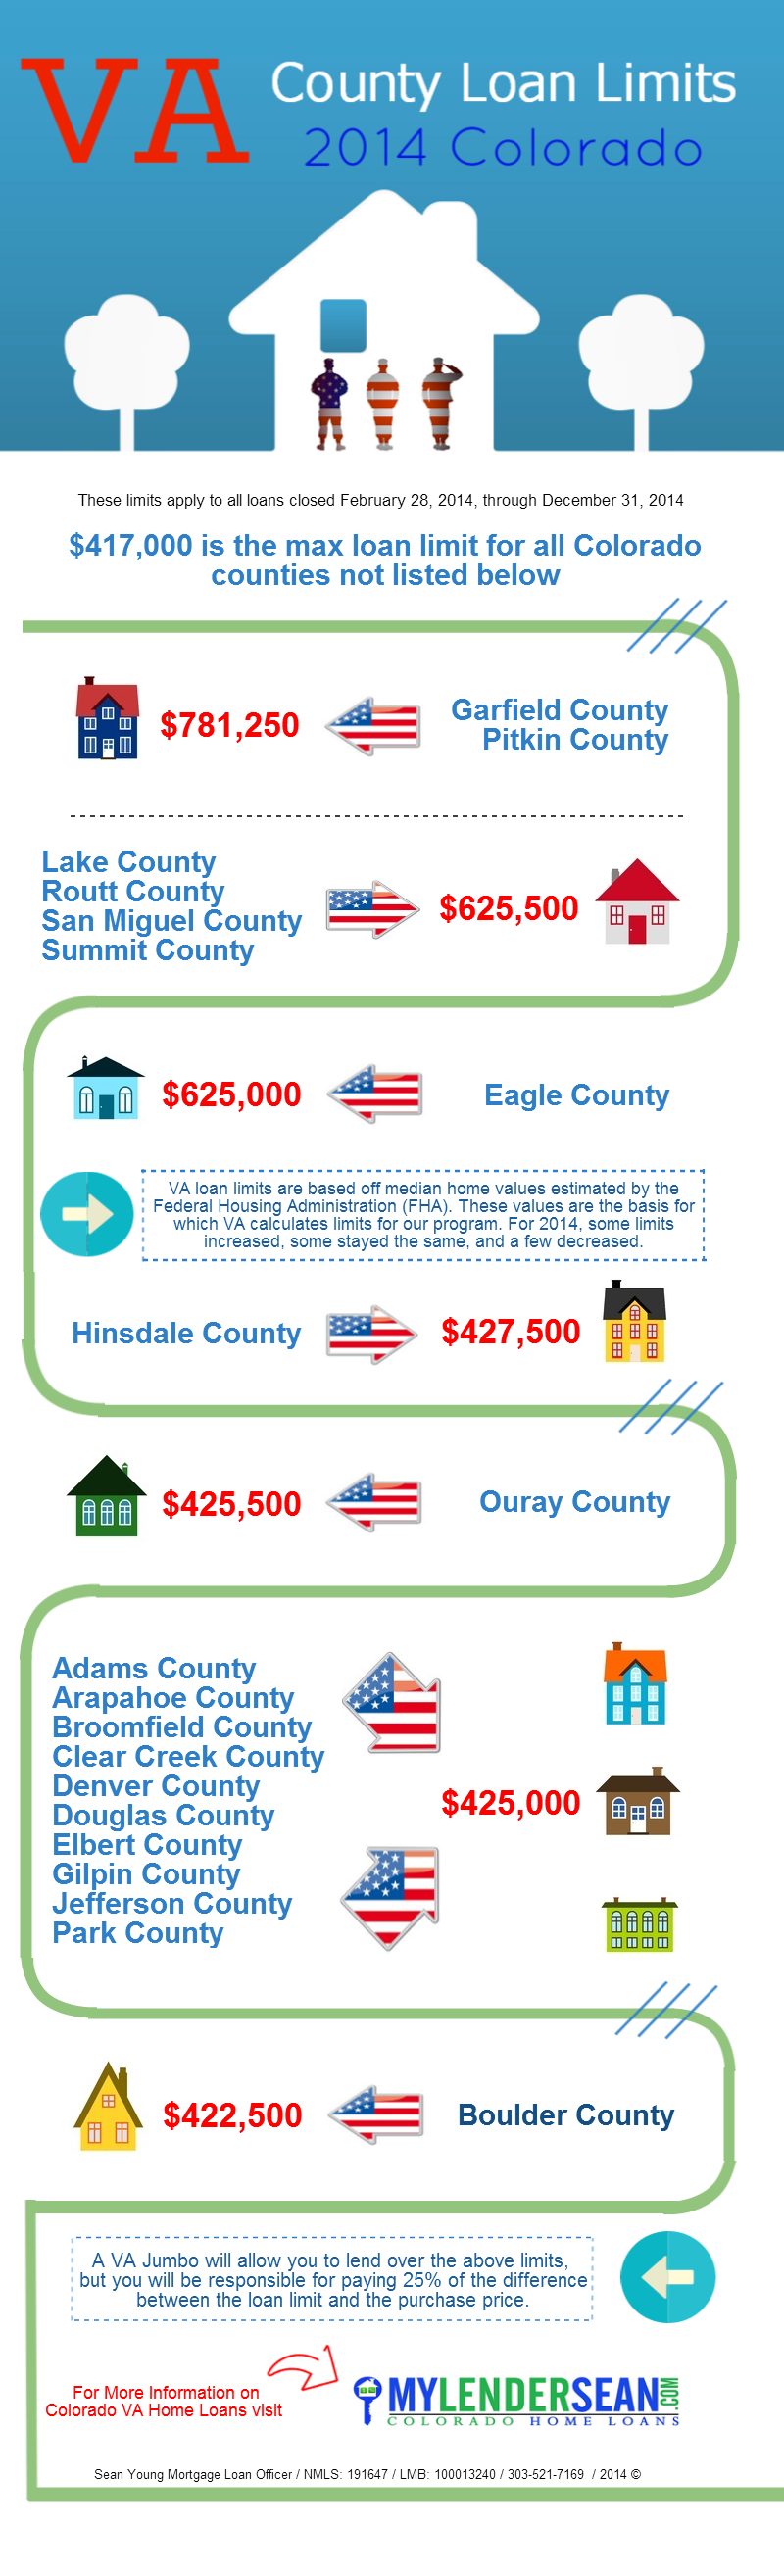 2014 Colorado Va County Loan Limits Infographic Infographic Loan Real Estate Infographic